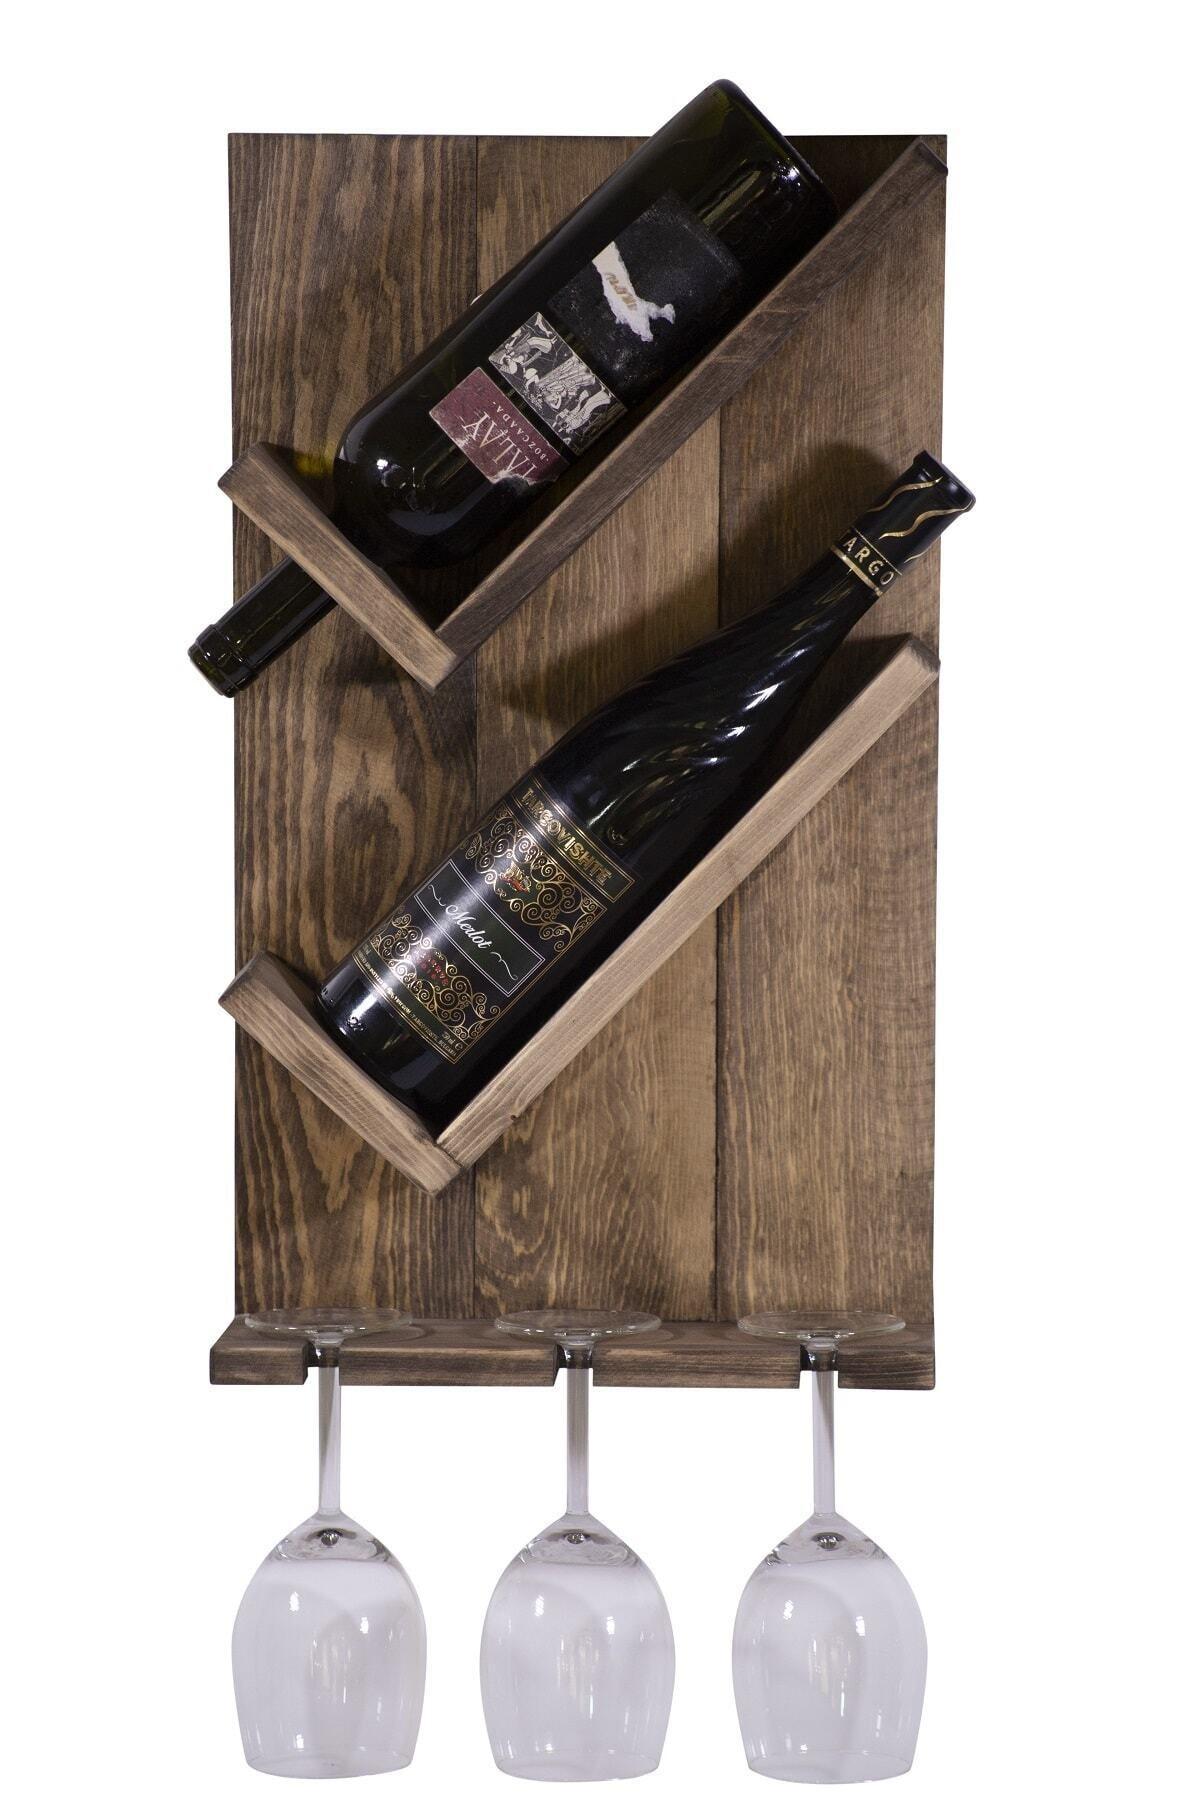 Wood Wine liquor alcohol Stand Wall Goblet Rack wine bottle holders decorative cabinet red wine display storage racks ootdty alcohol refractometer range 0 80% v v atc manuel focusing for wine liquor test a5yd